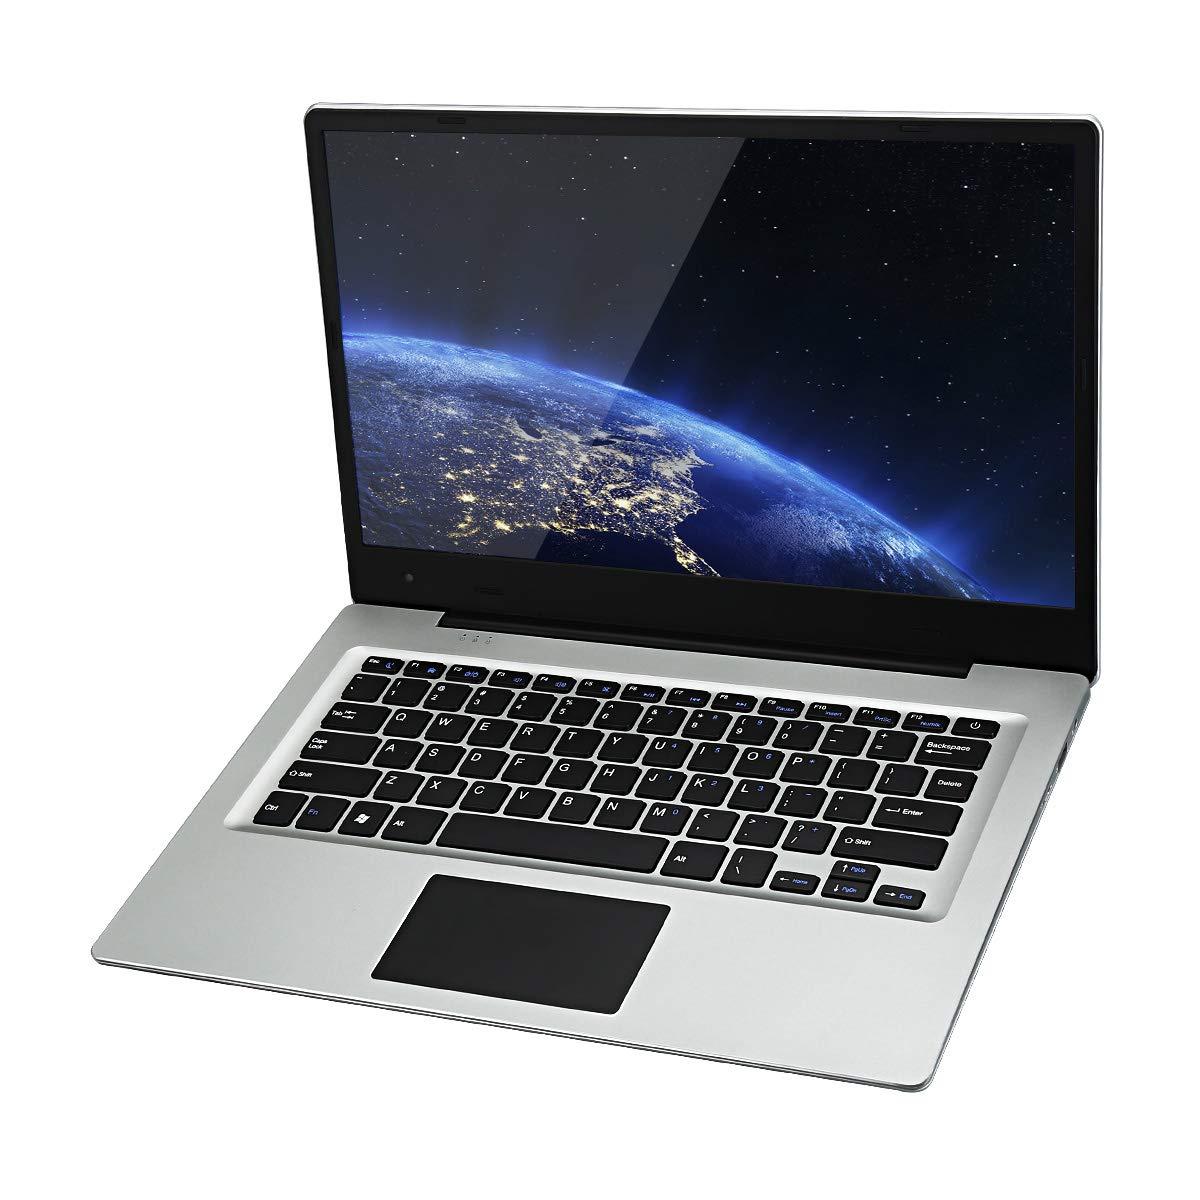 JUMPER EZbook 3S Notebook -14.1 Pulgadas (Portátil de Windows 10,Intel Celeron Processor N3450, Quad Core 1.1GHz, 6GB RAM + 256GB SSD) Portátil Plata: ...